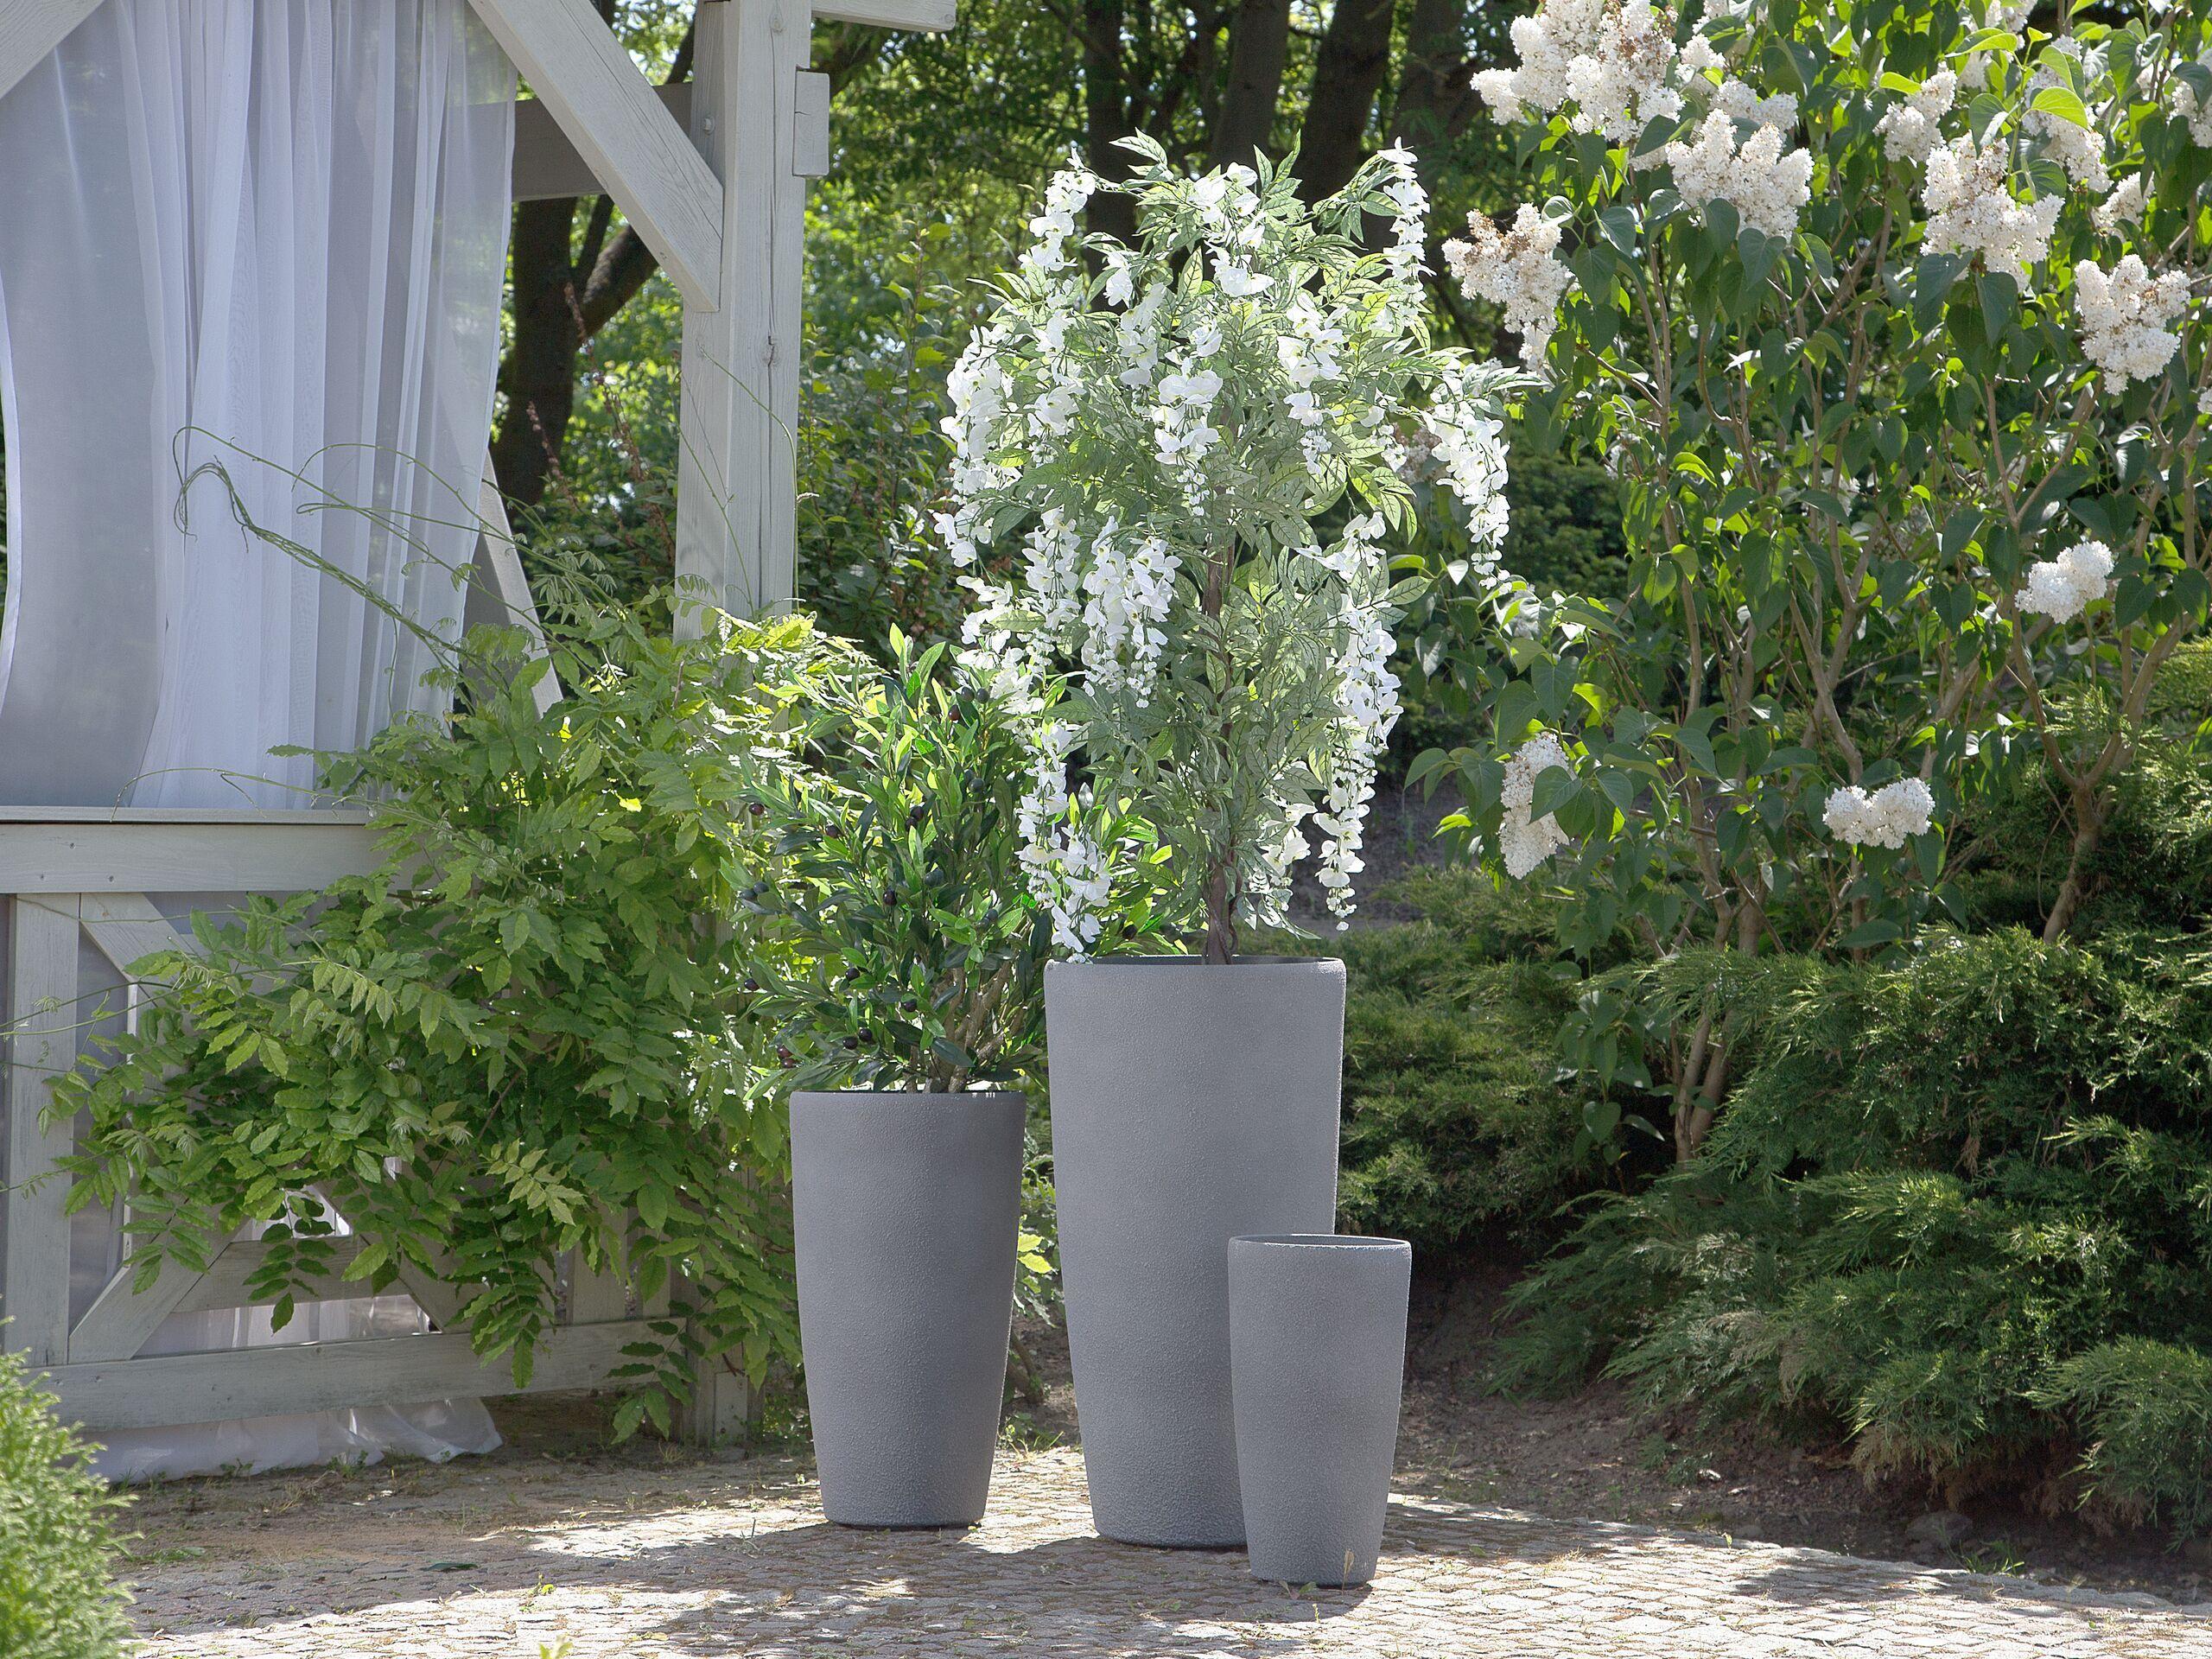 beliani set 3 vasi per piante in simil pietra grigia varie dimensioni resistenti